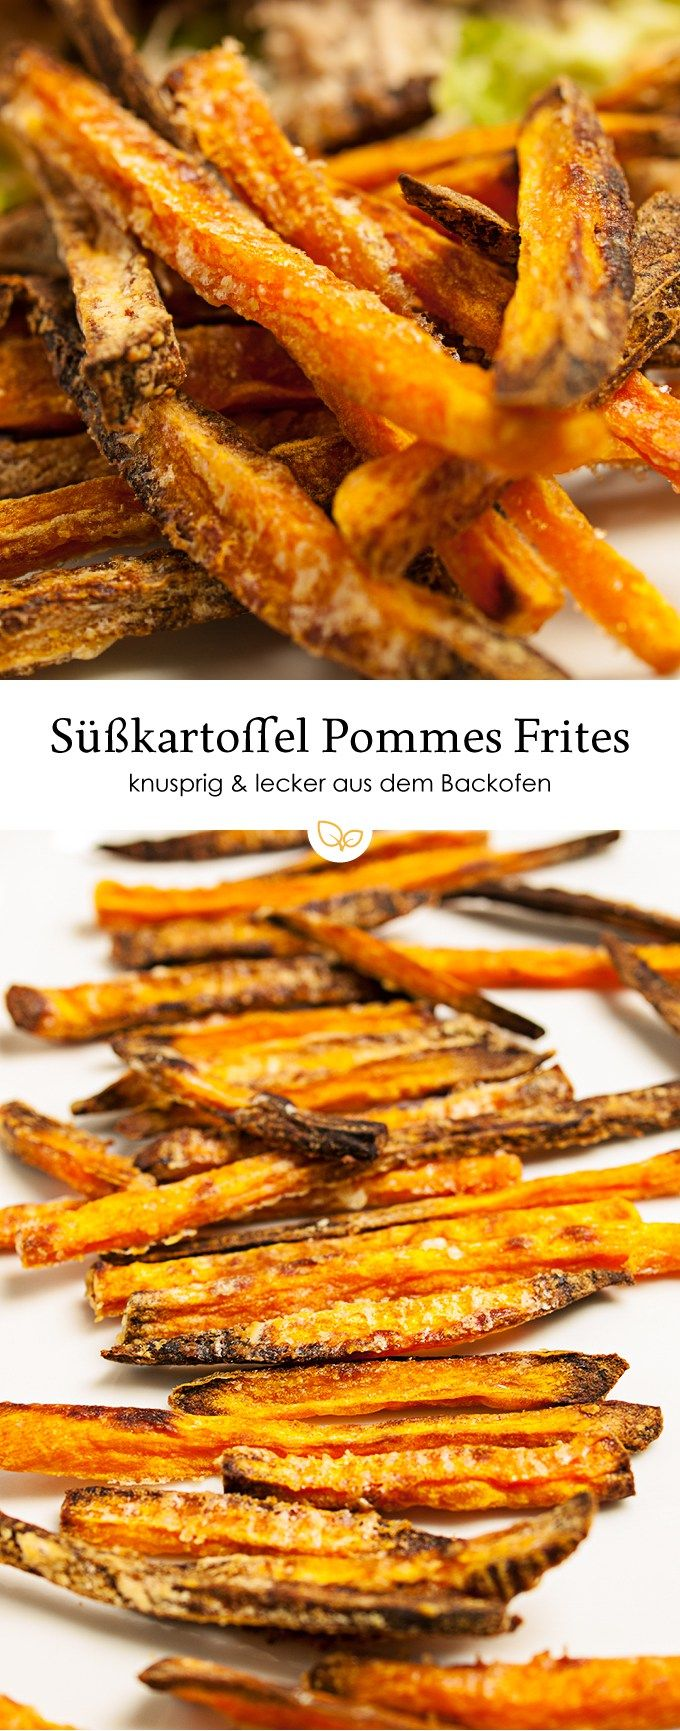 Süßkartoffel-Pommes frites #gezondeten